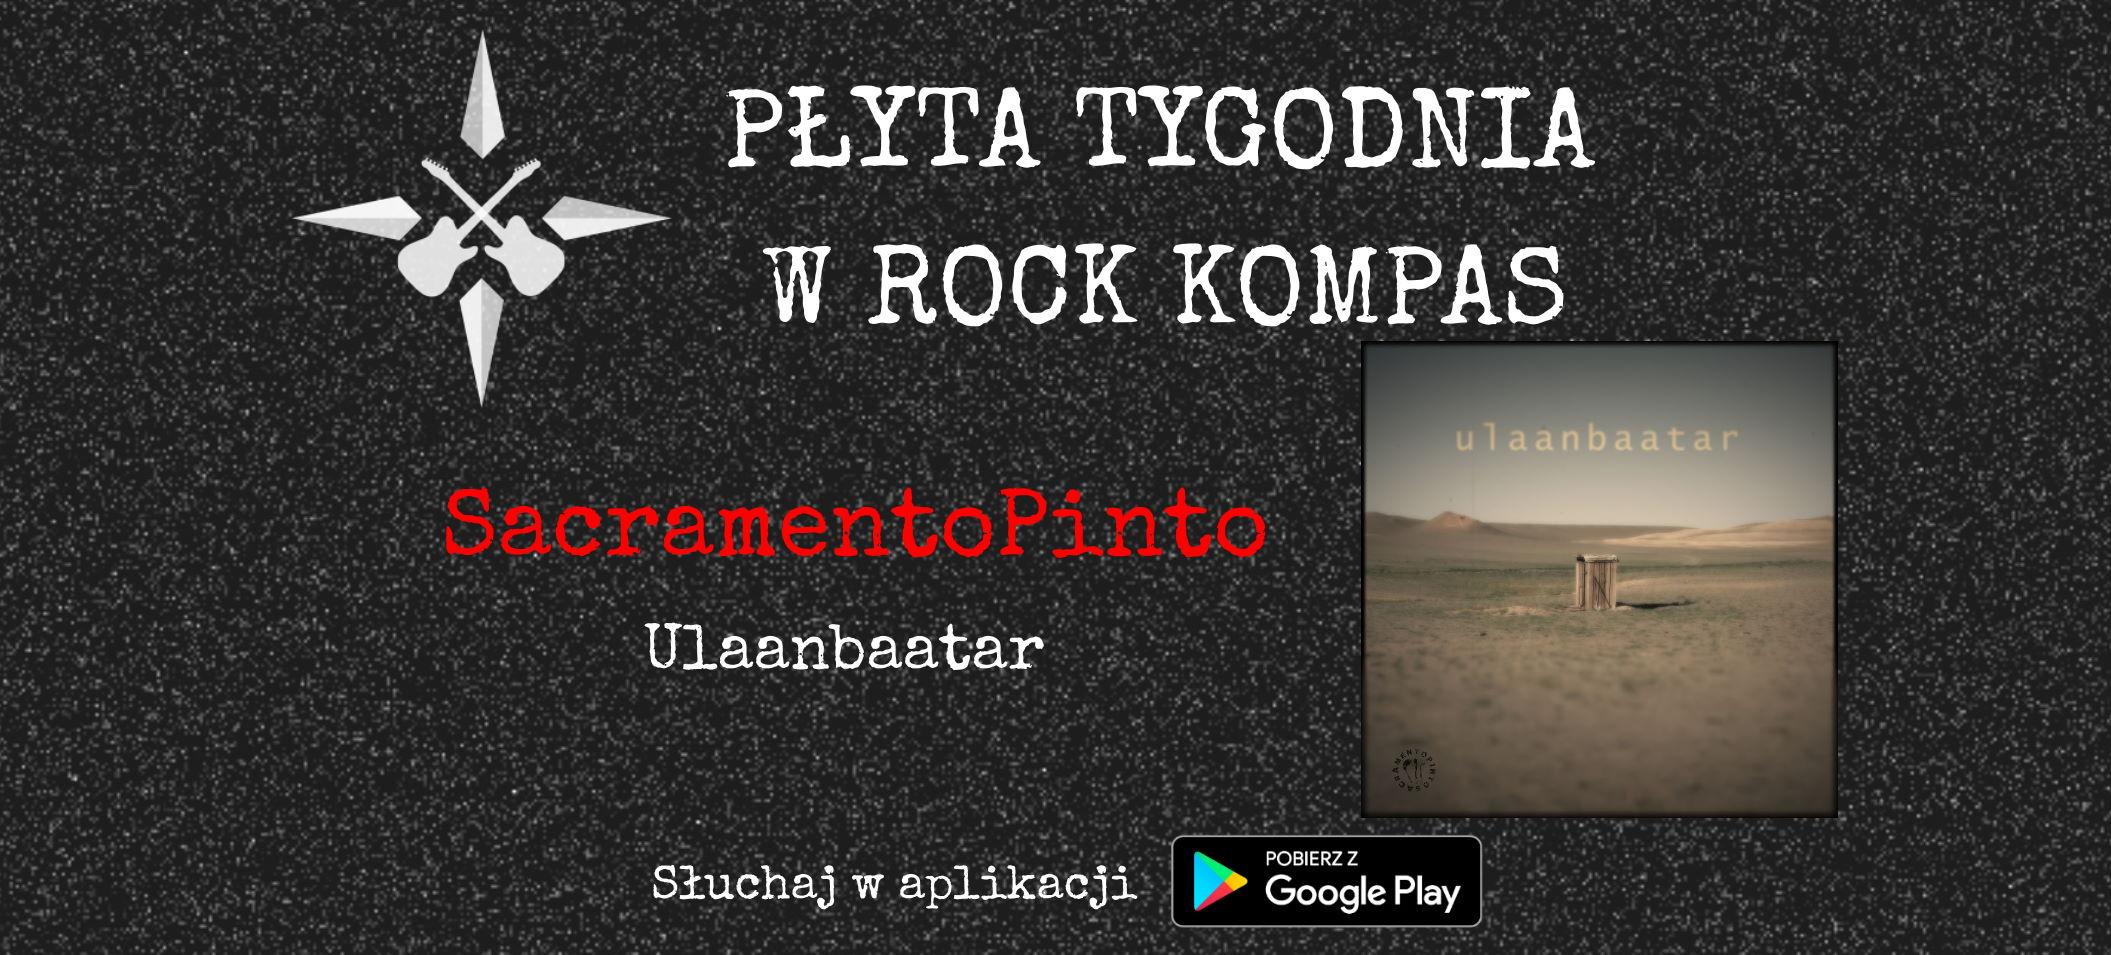 Płyta tygodnia w Rock Kompas: SacramentoPinto - Ulaanbaatar